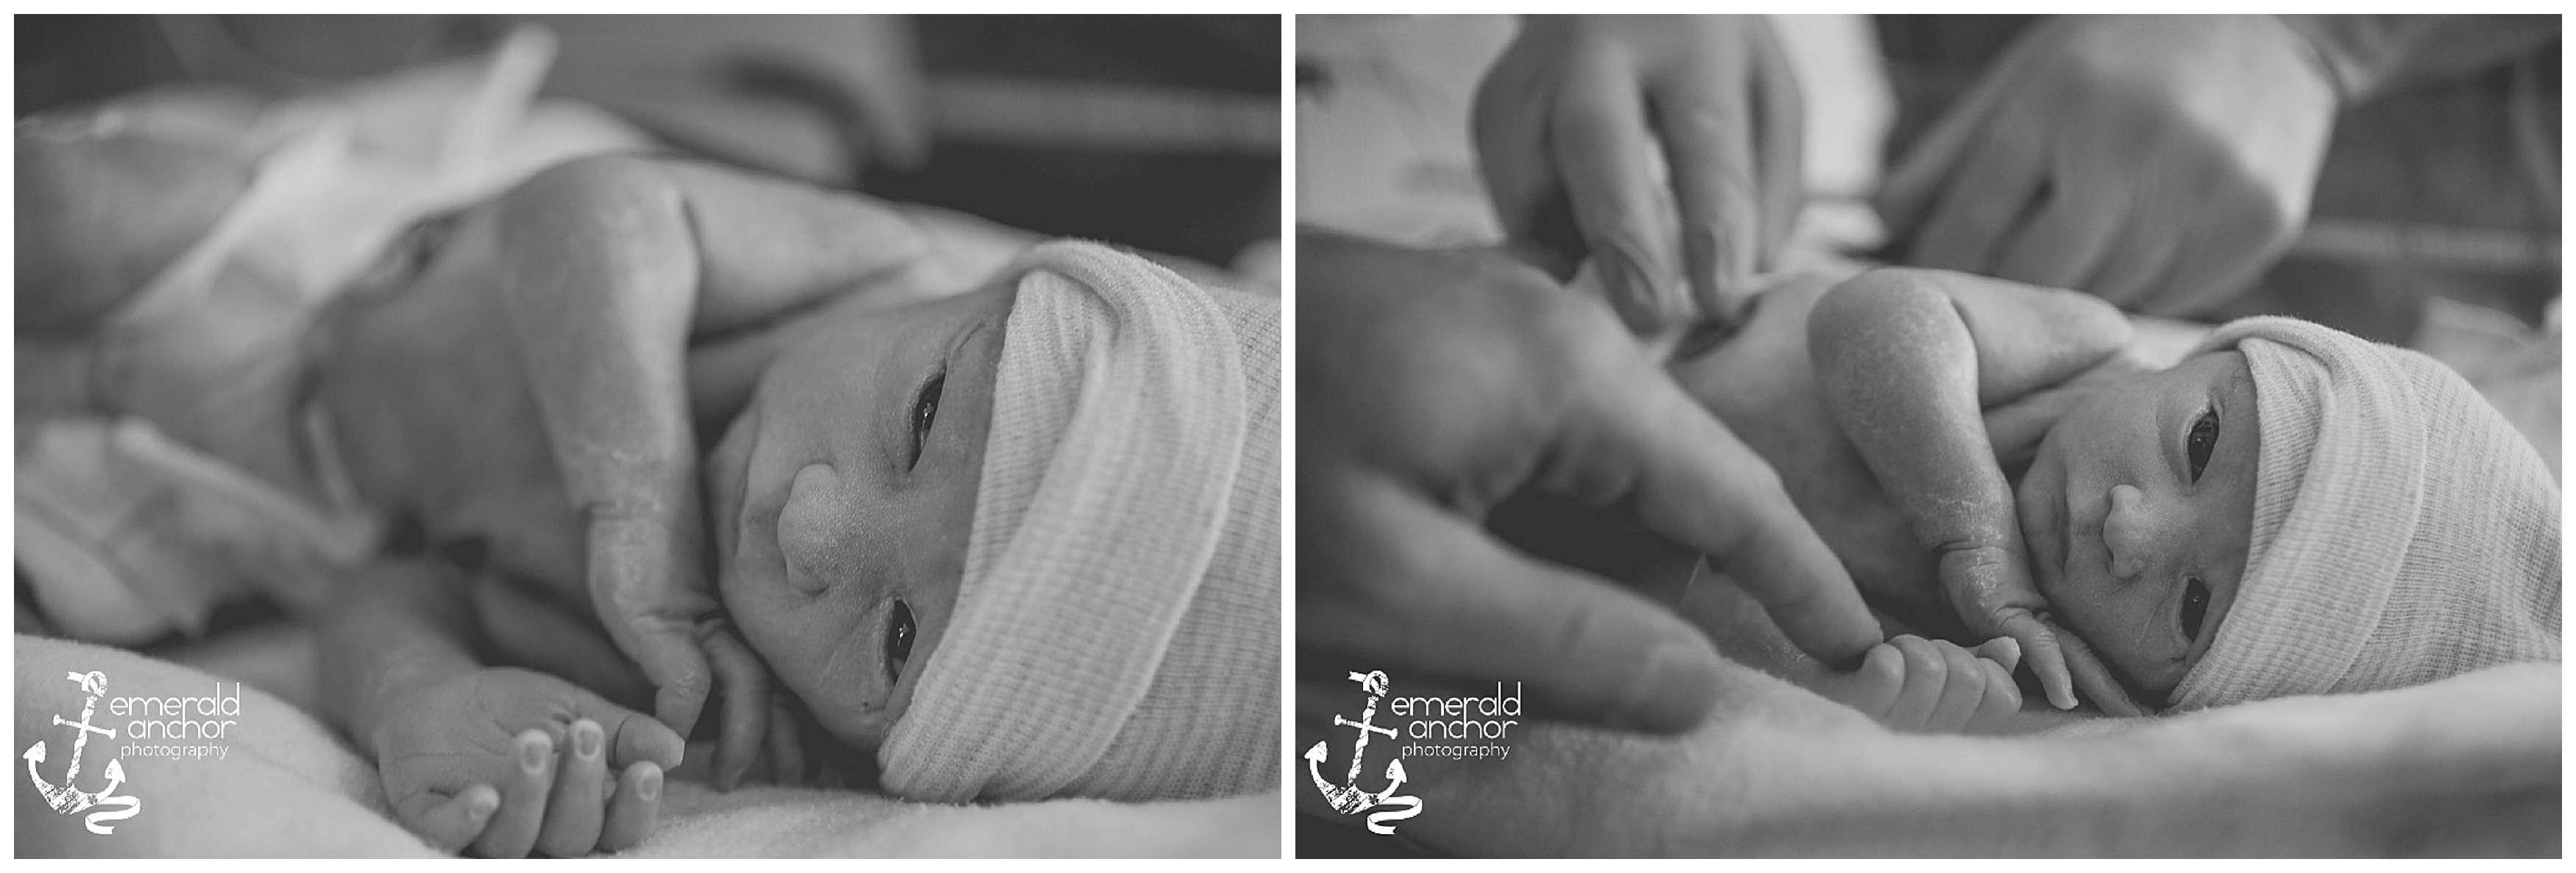 Emerald Anchor Photography Riverside Hospital Birth Story Photography Uriah Kade (60)